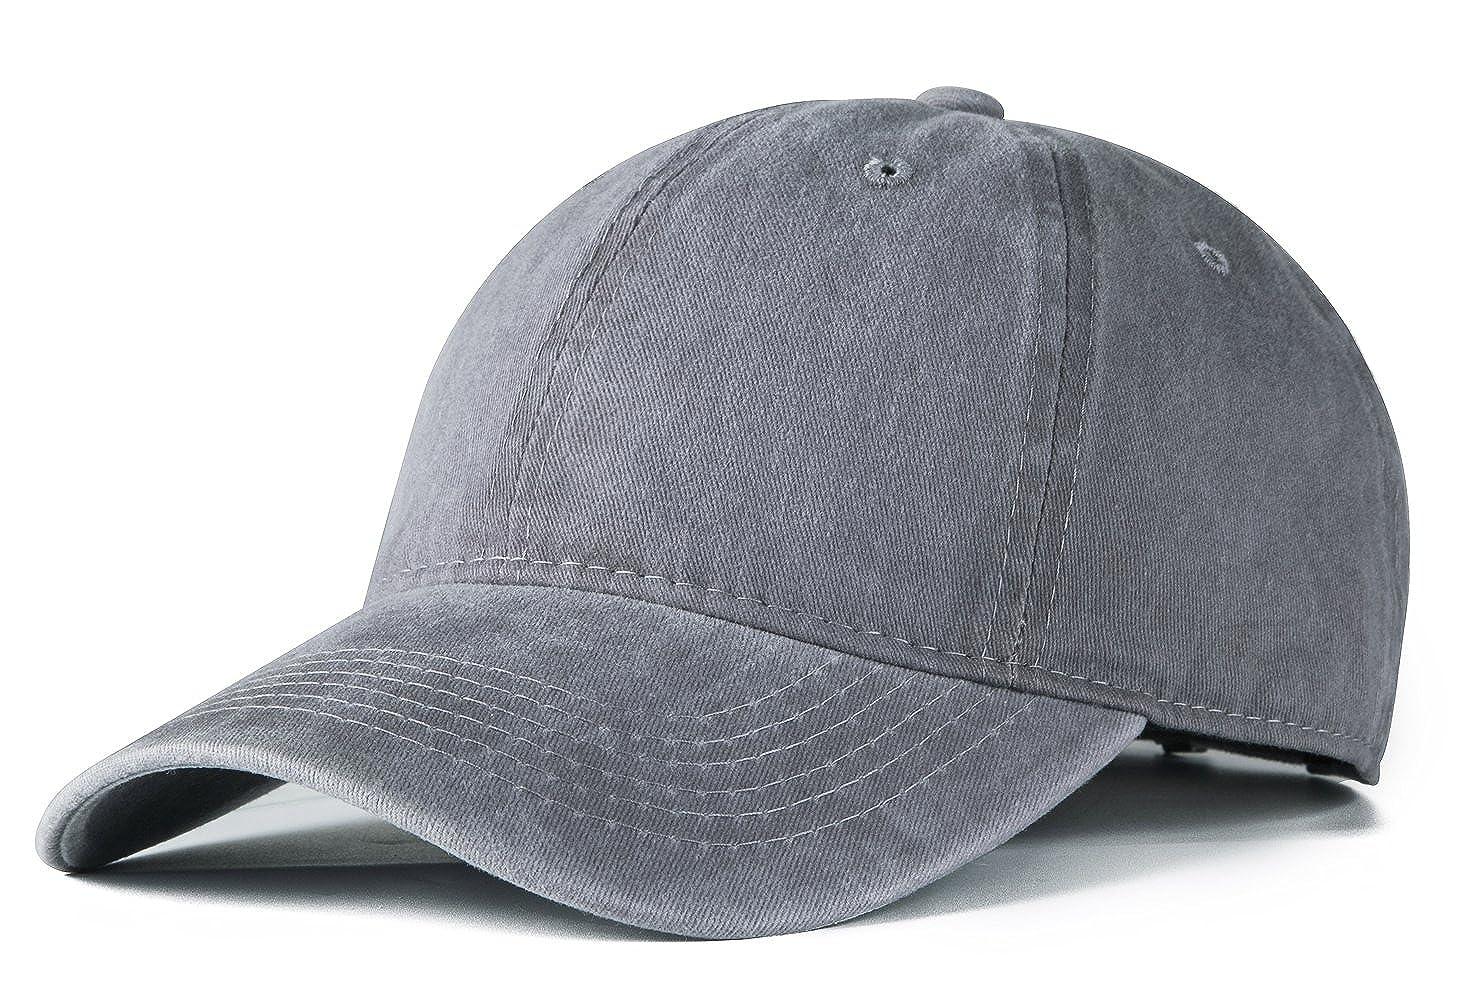 4fe0fbd5e97 Edoneery Men Women Cotton Adjustable Washed Twill Low Profile Plain  Baseball Cap Hat (Grey) at Amazon Women s Clothing store